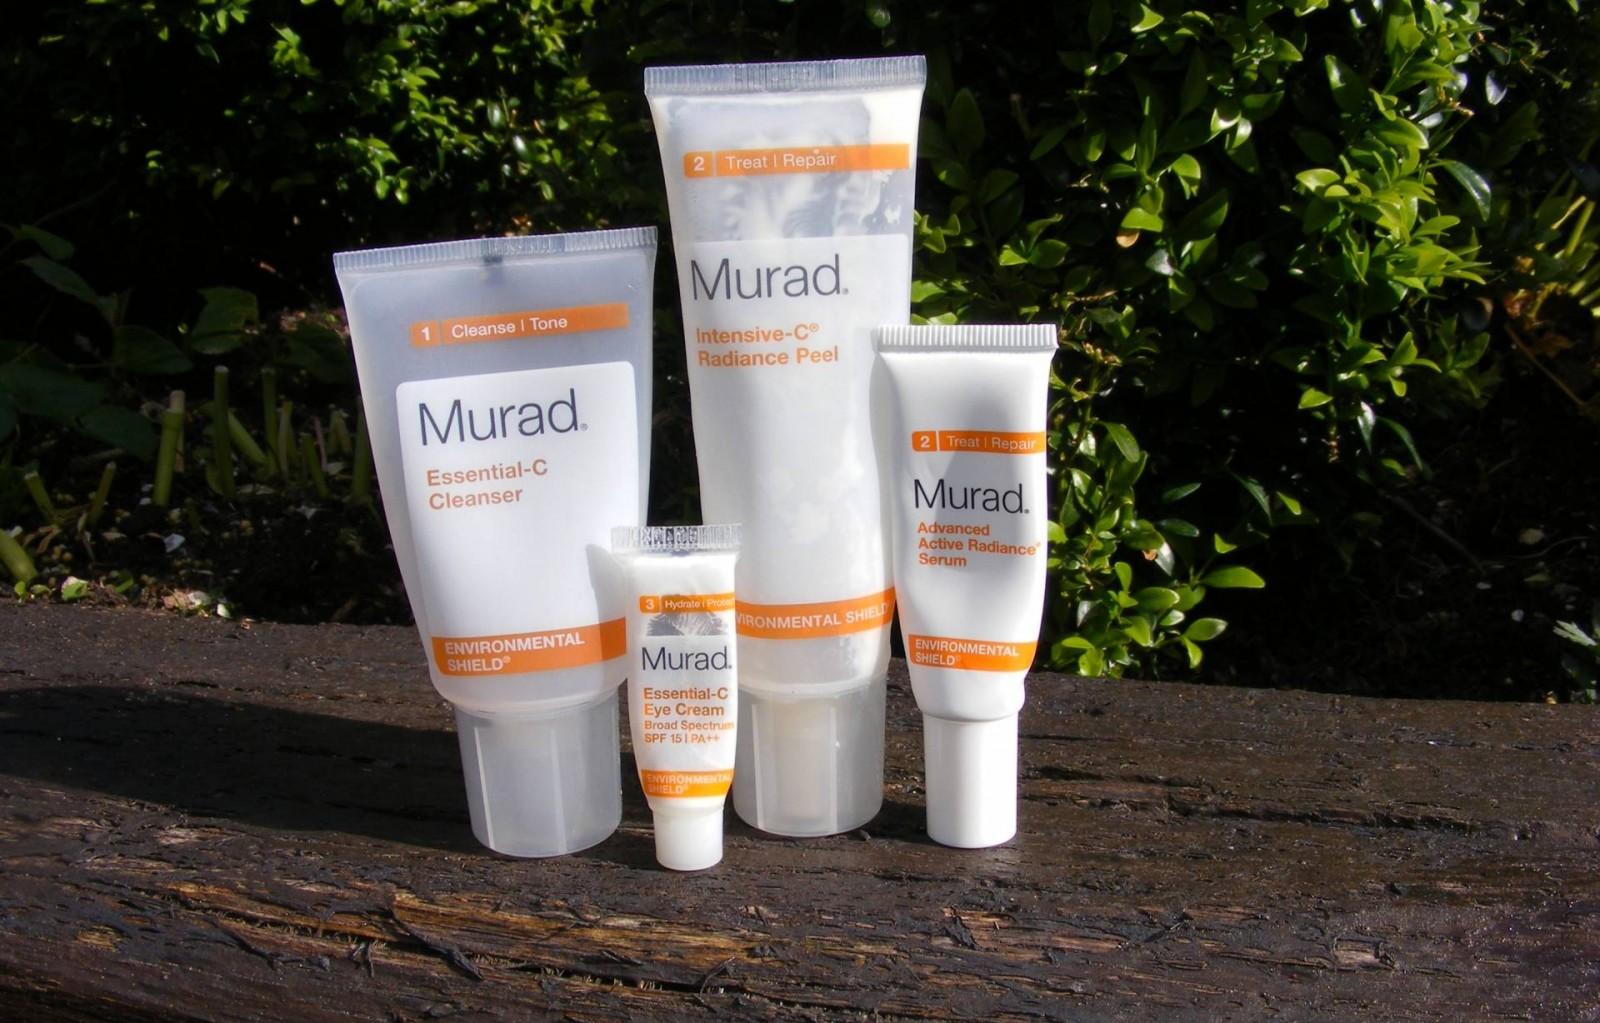 May empties Murad Essential C cleanser